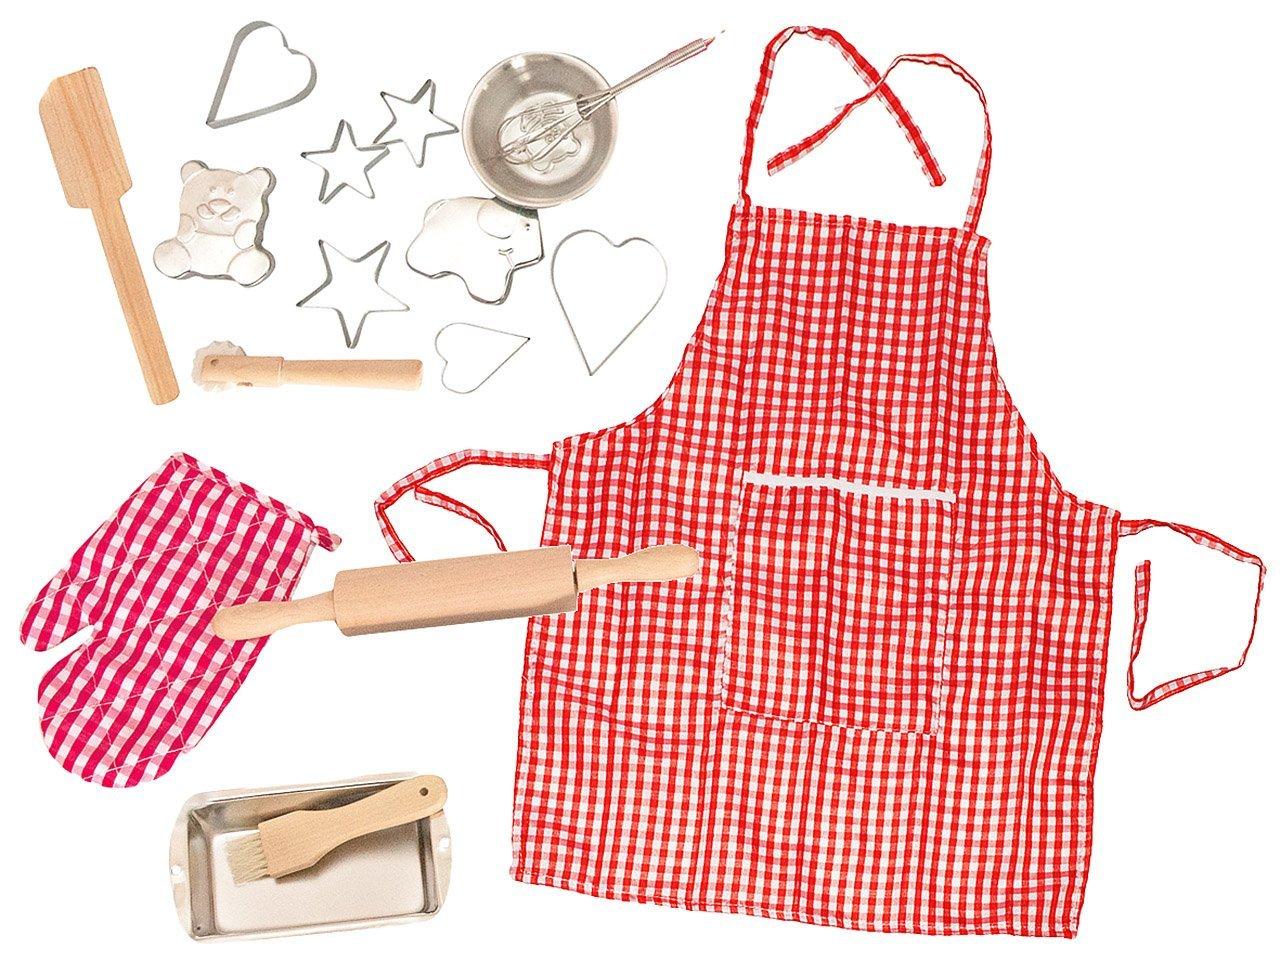 17 tlg. Kochset incl. Namen - Backset aus Metall + Küchenhelfer + ...